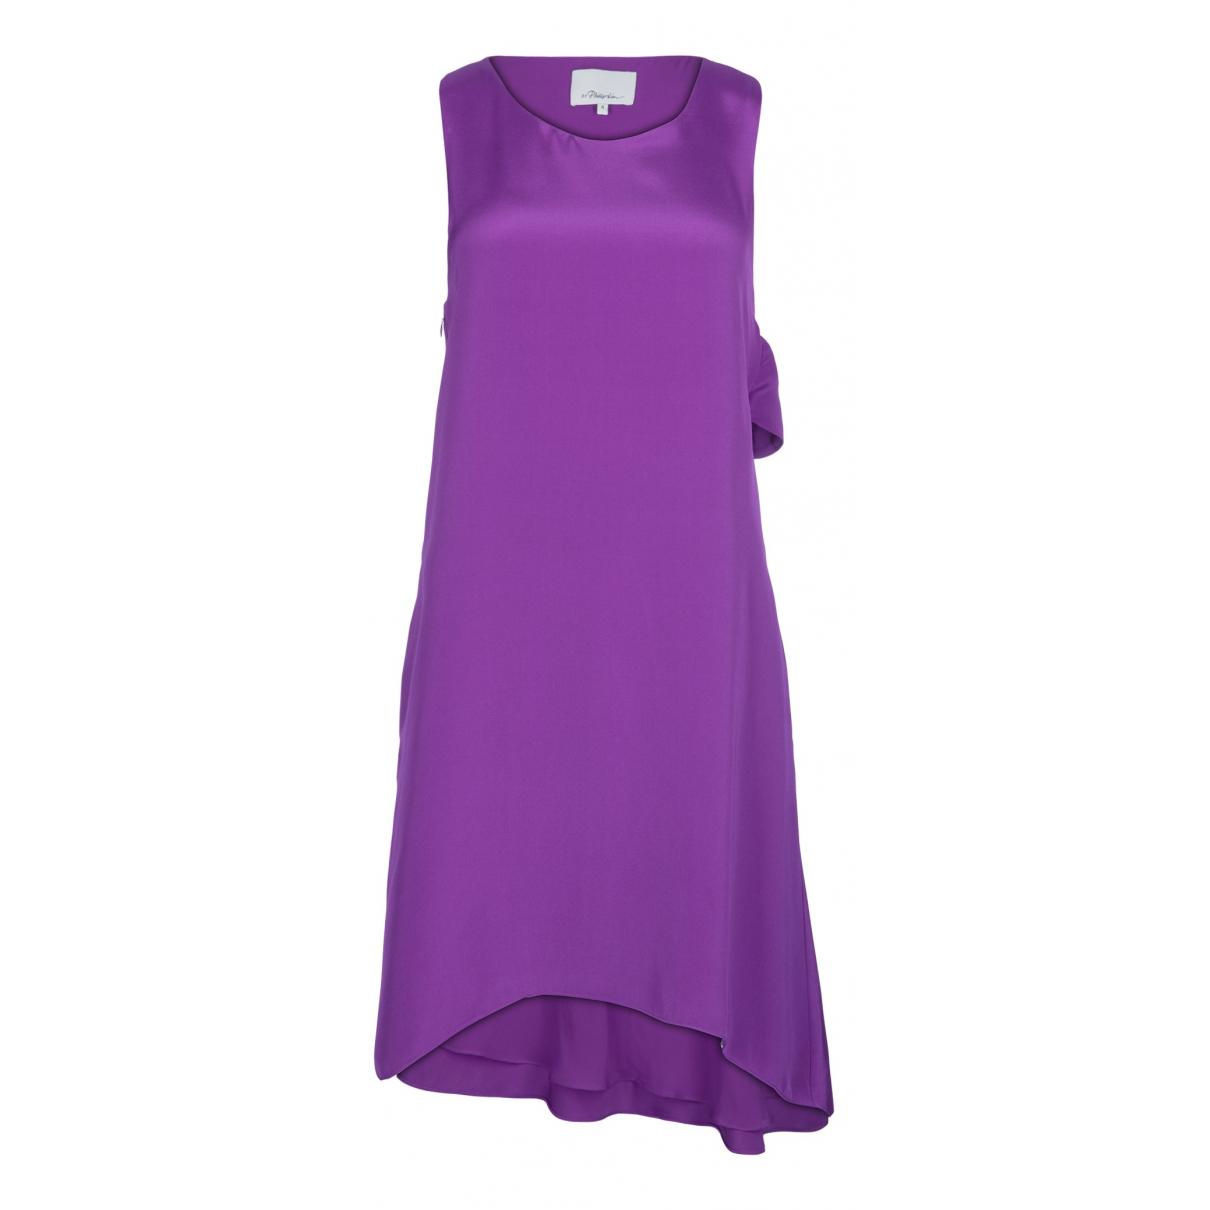 3.1 Phillip Lim N Purple Silk dress for Women 12 UK